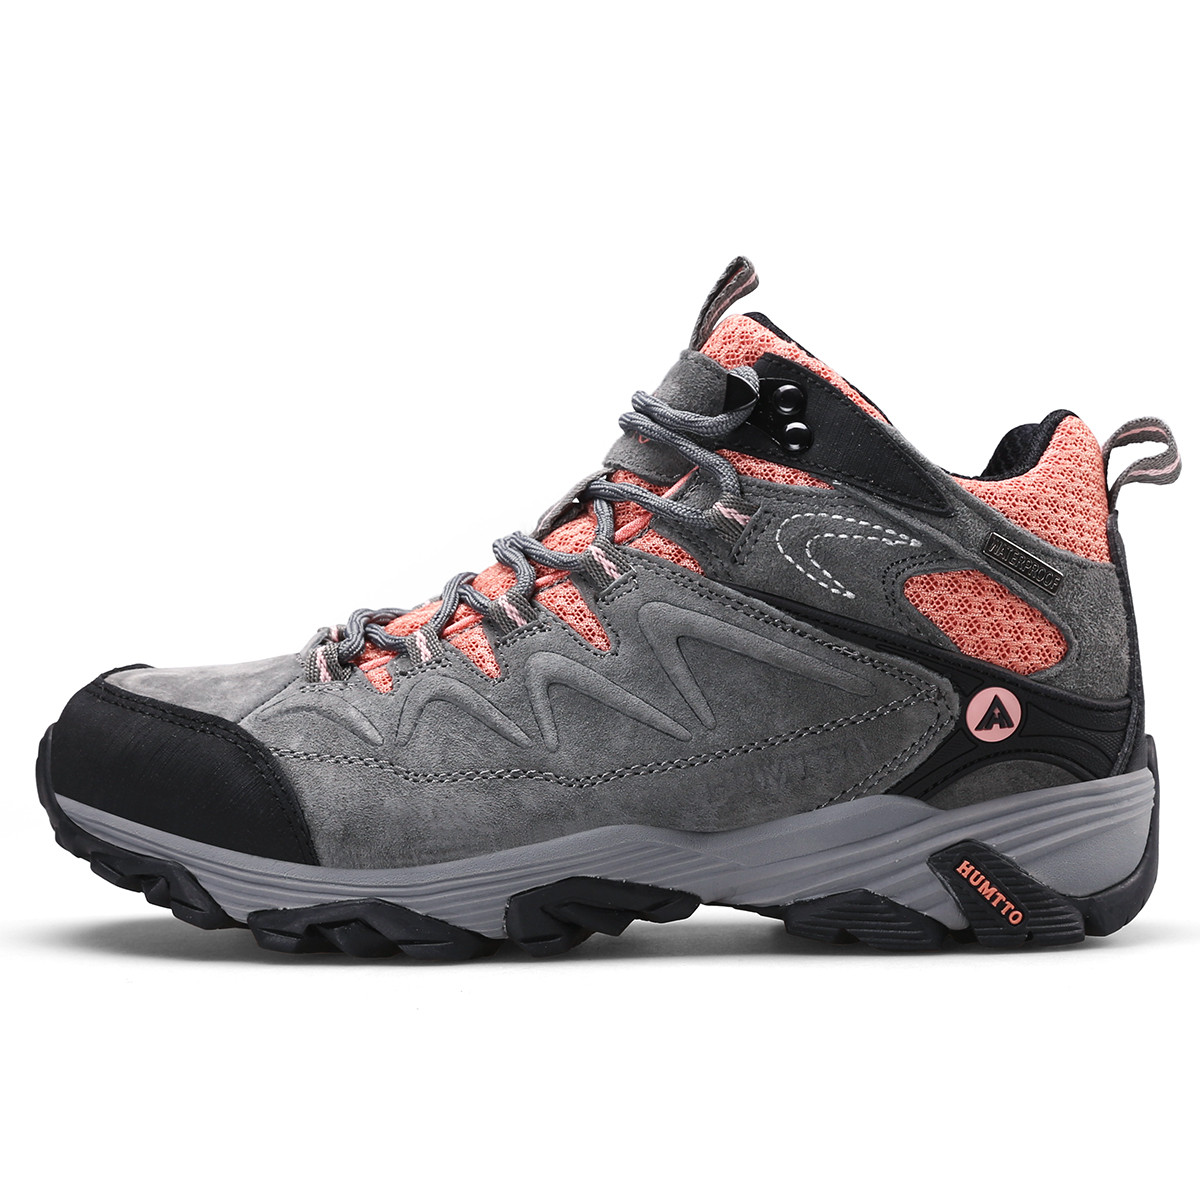 کفش کوهنوردی زنانه هامتو مدل 4-6520